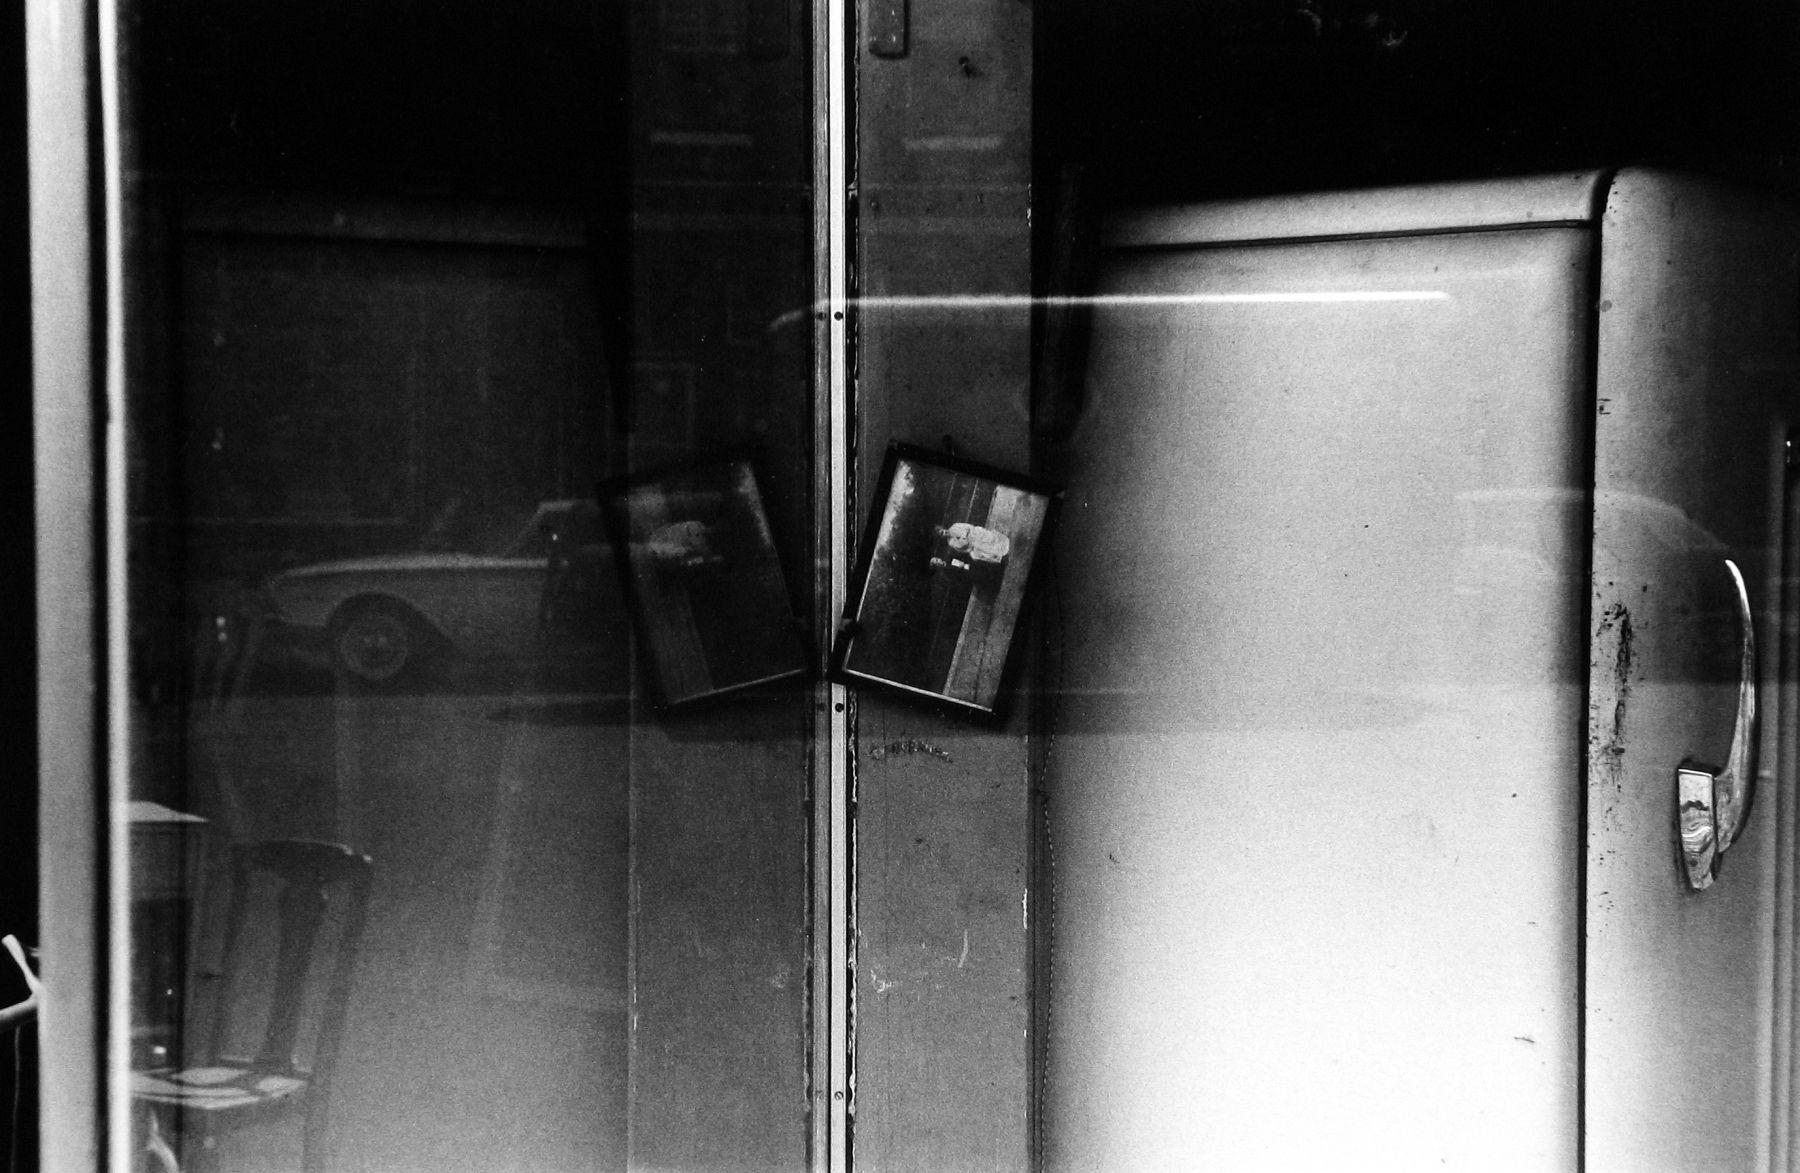 Don Donaghy, Philadelphia, 1961, Bard x HGG, Howard Greenberg Gallery, 2019